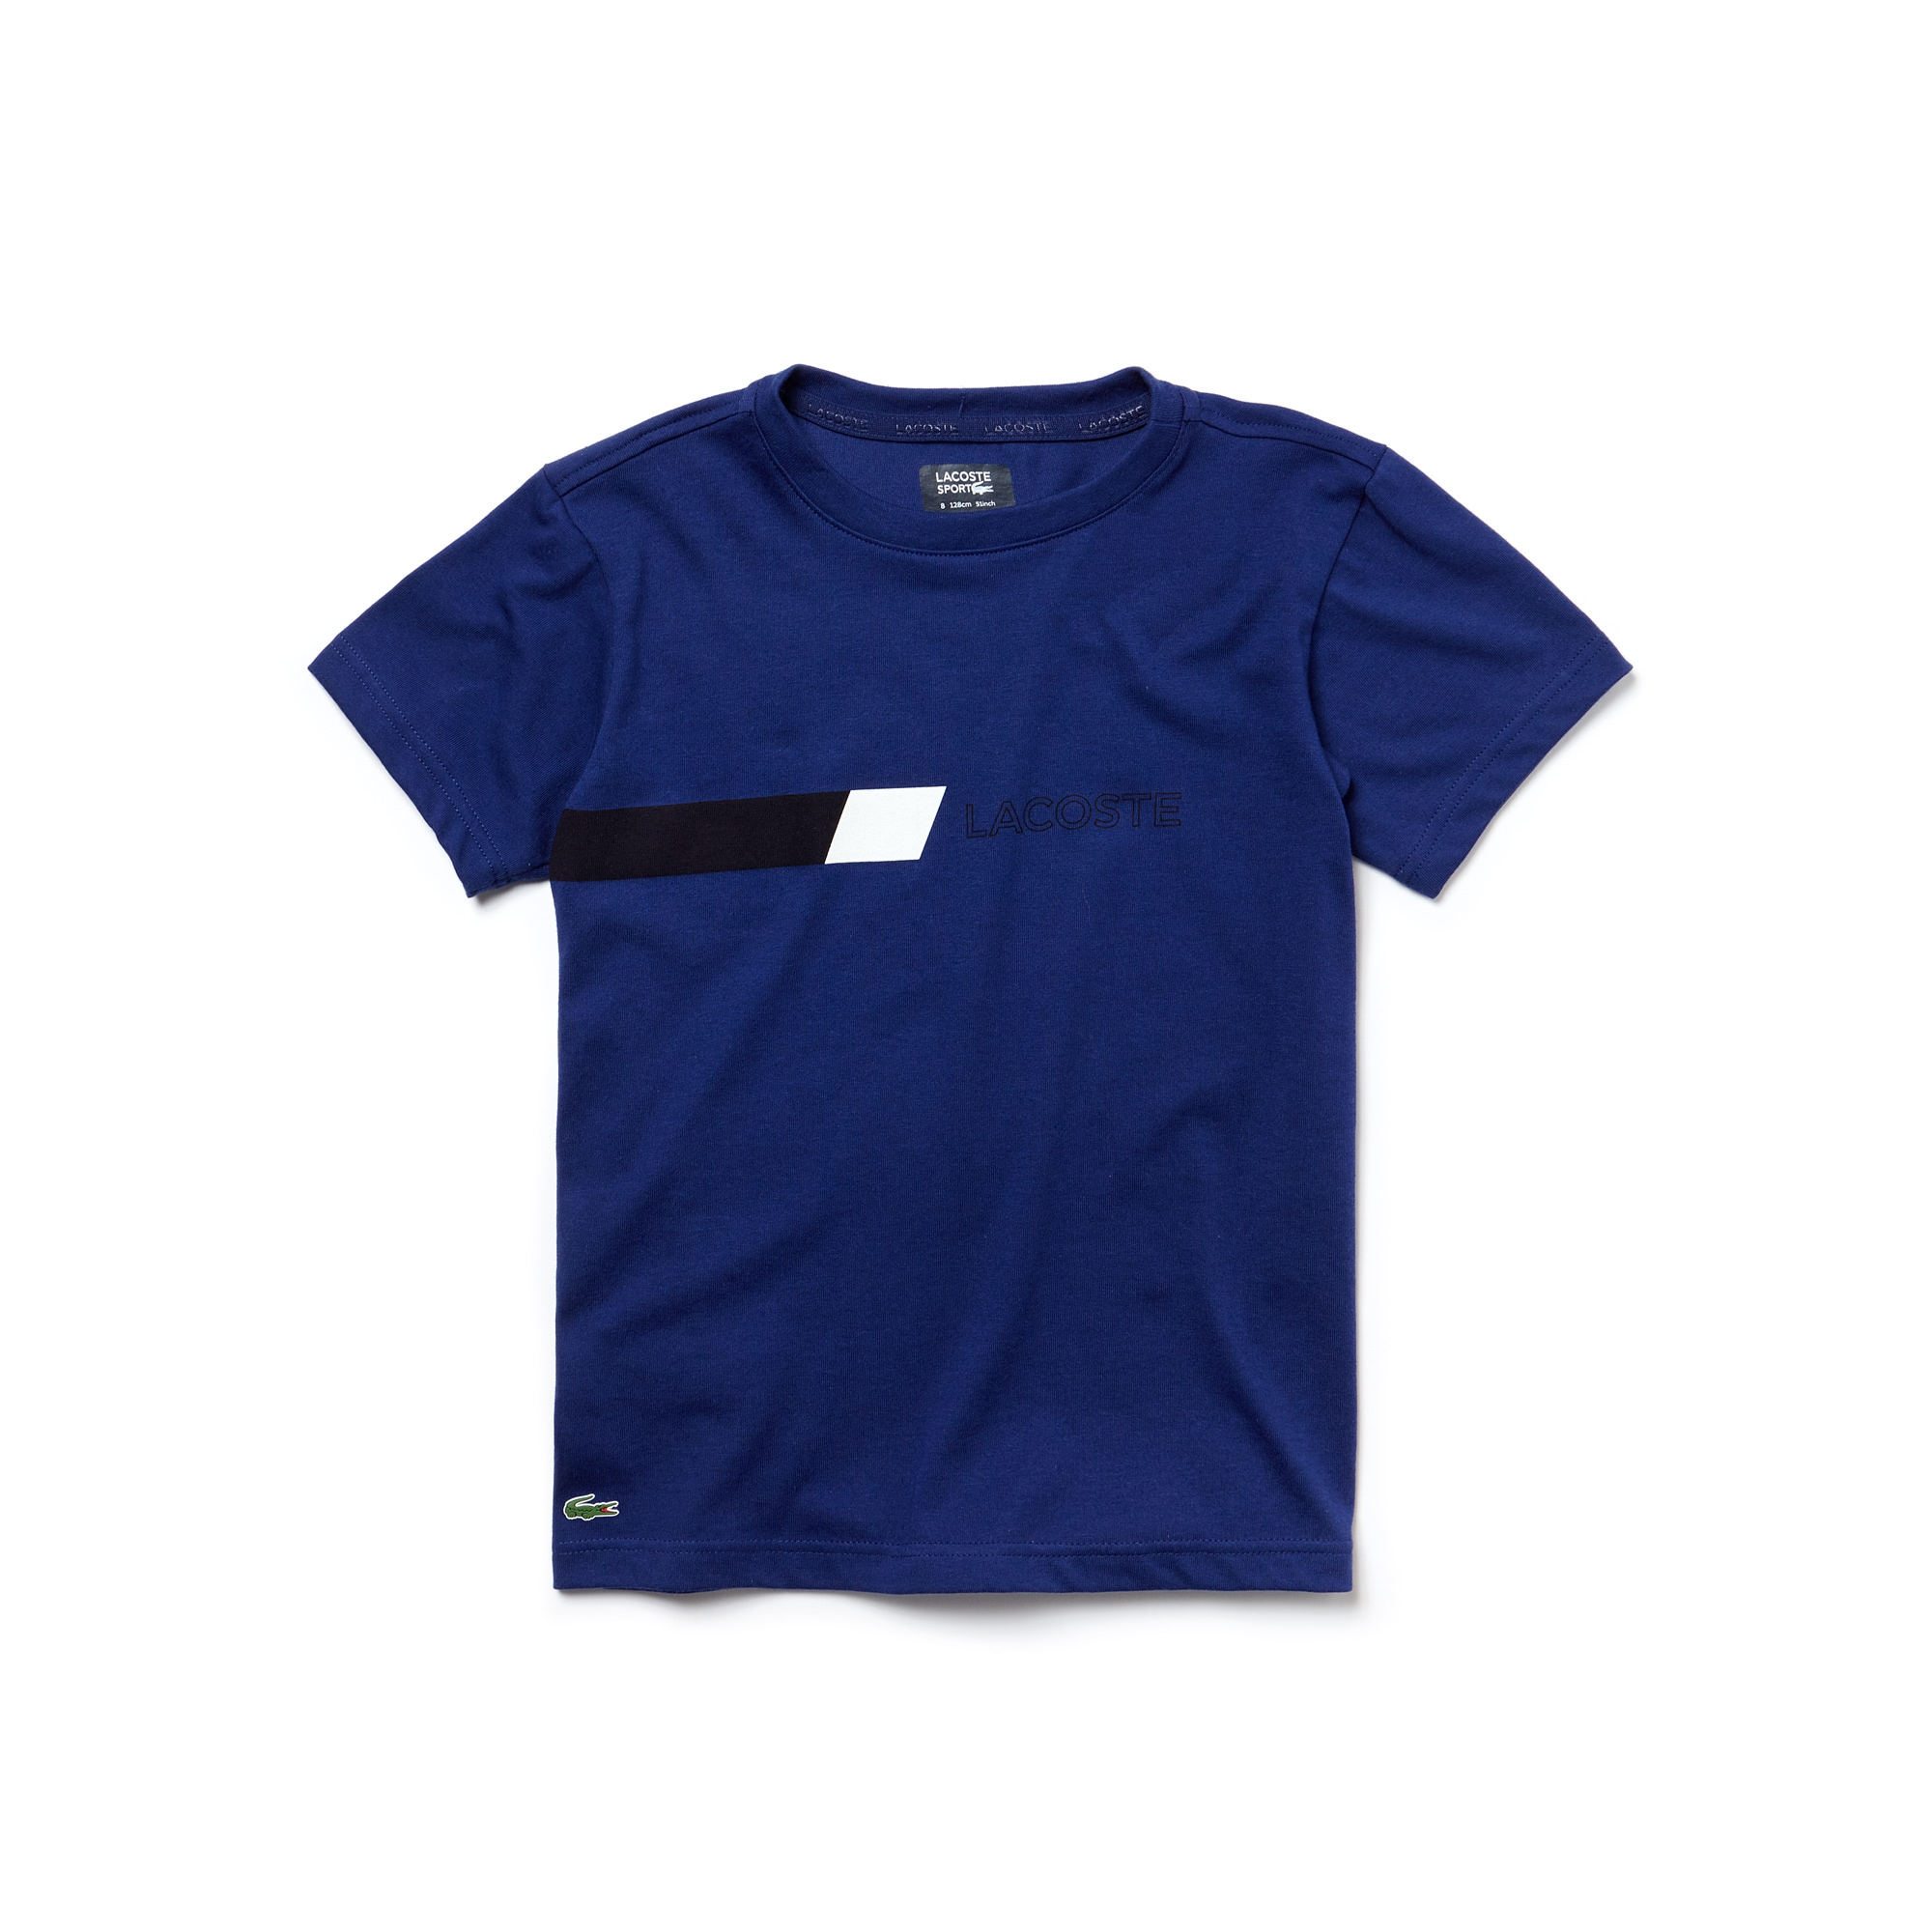 Boys'  SPORT Tennis Colorblock Accent Jersey T-shirt